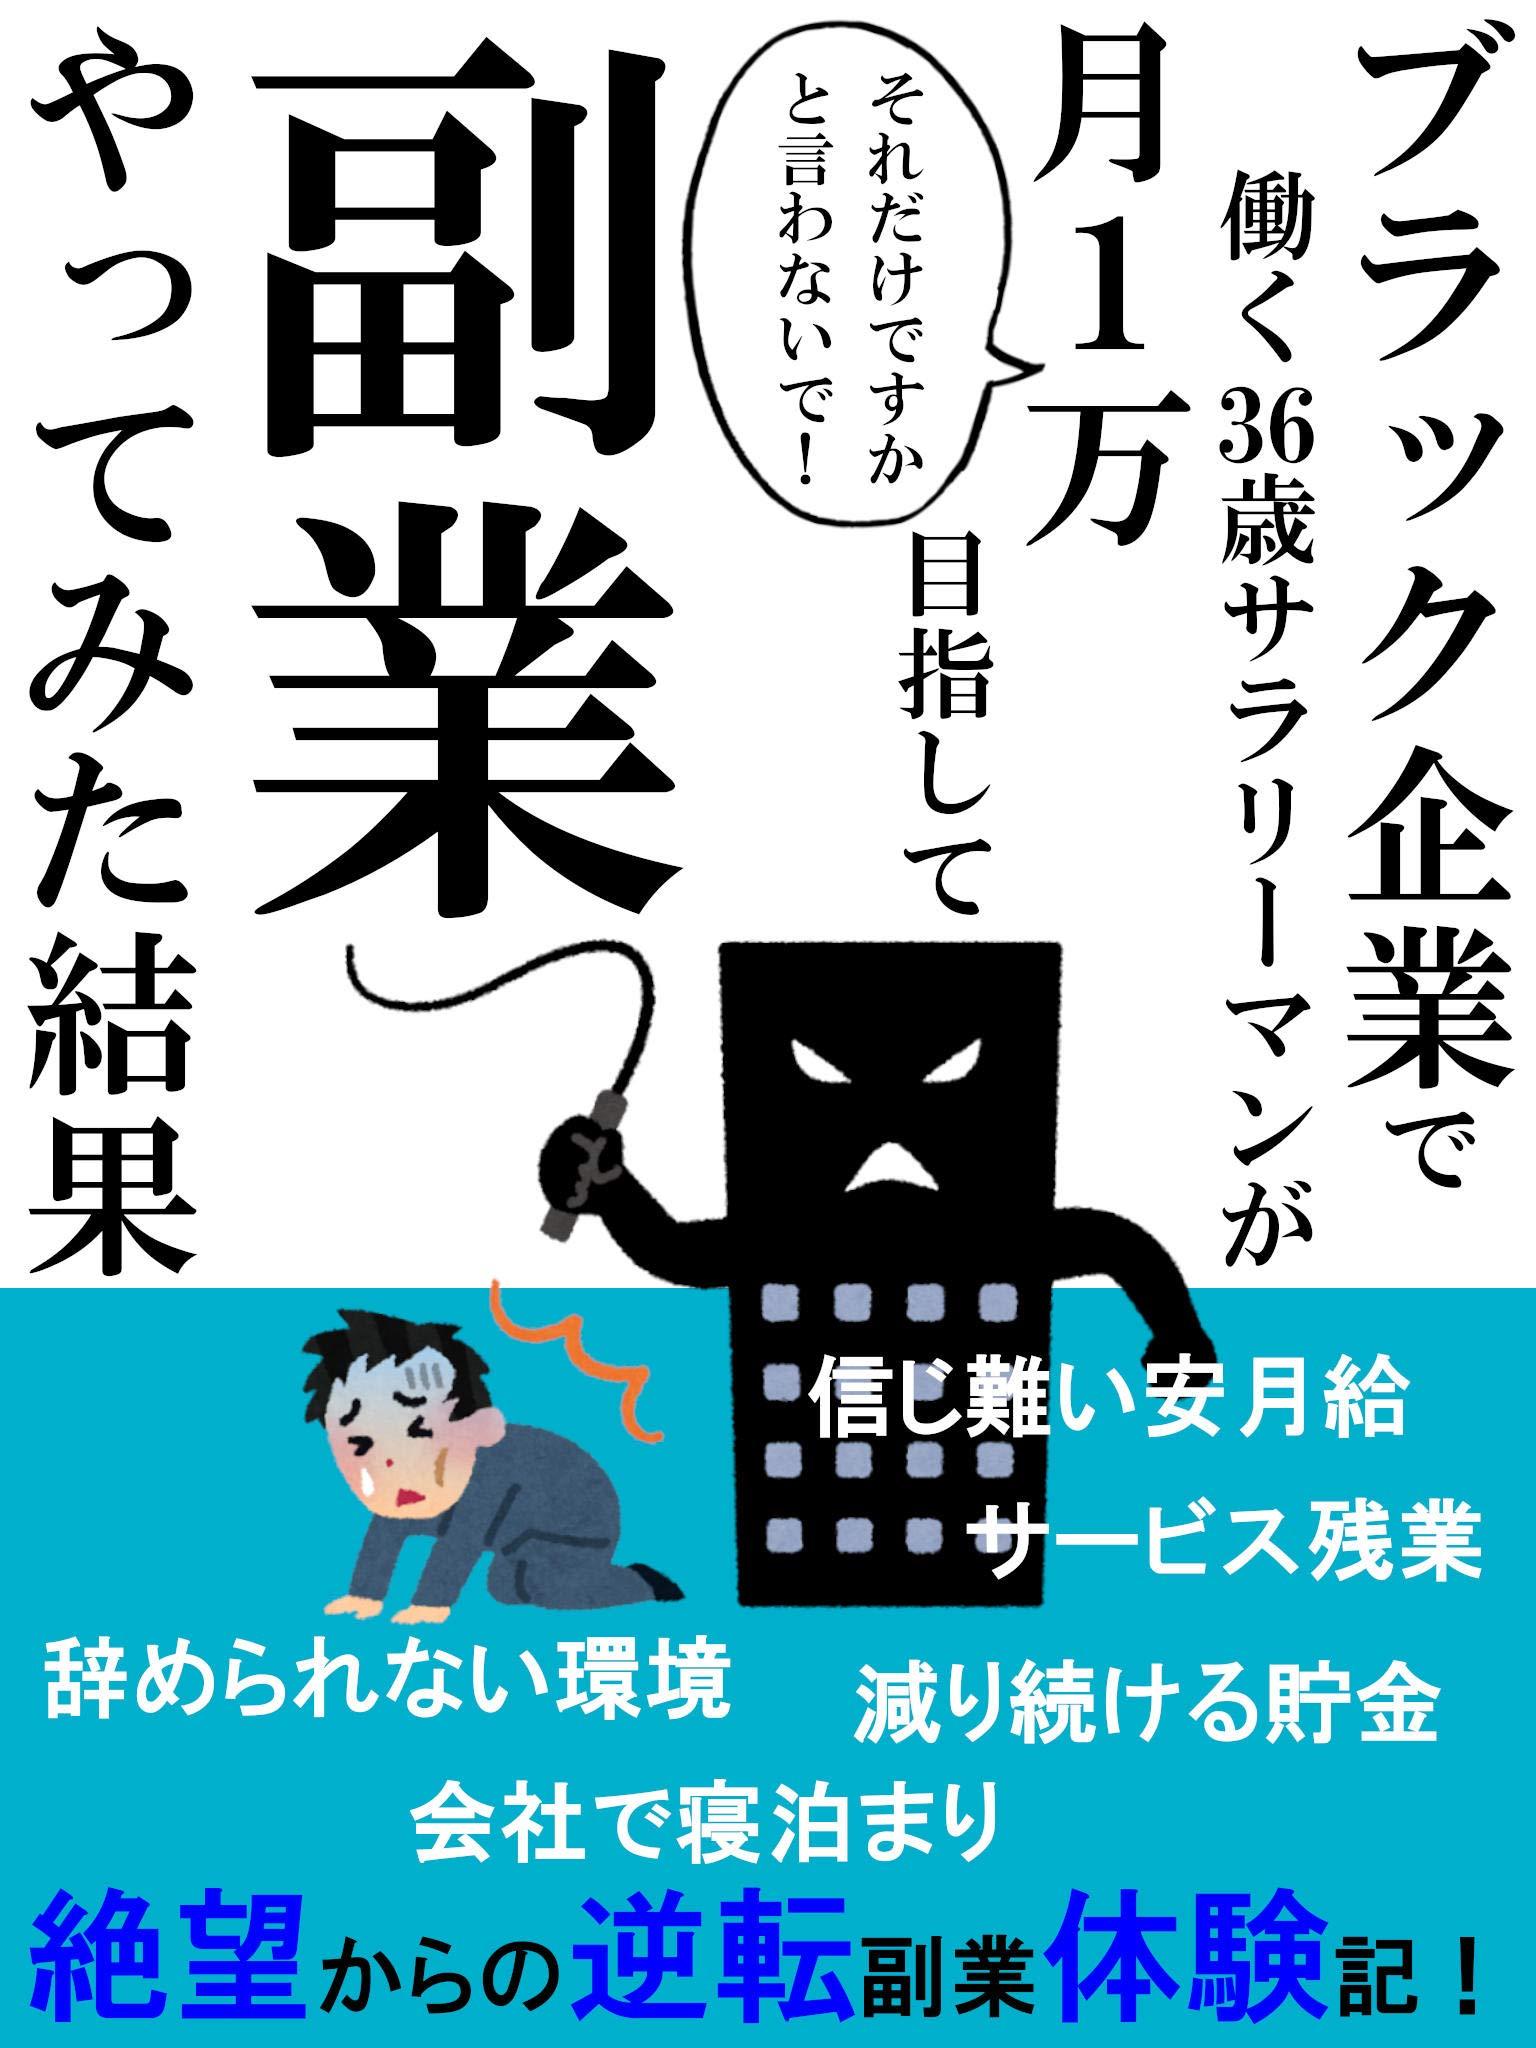 burakkukigyoudehatarakusanjyuurokusaisarariimangatukiitimanenmezasitefukugyouyattemitakekkazetuboukaranogyakutenfukugyoutaikenki (Japanese Edition)